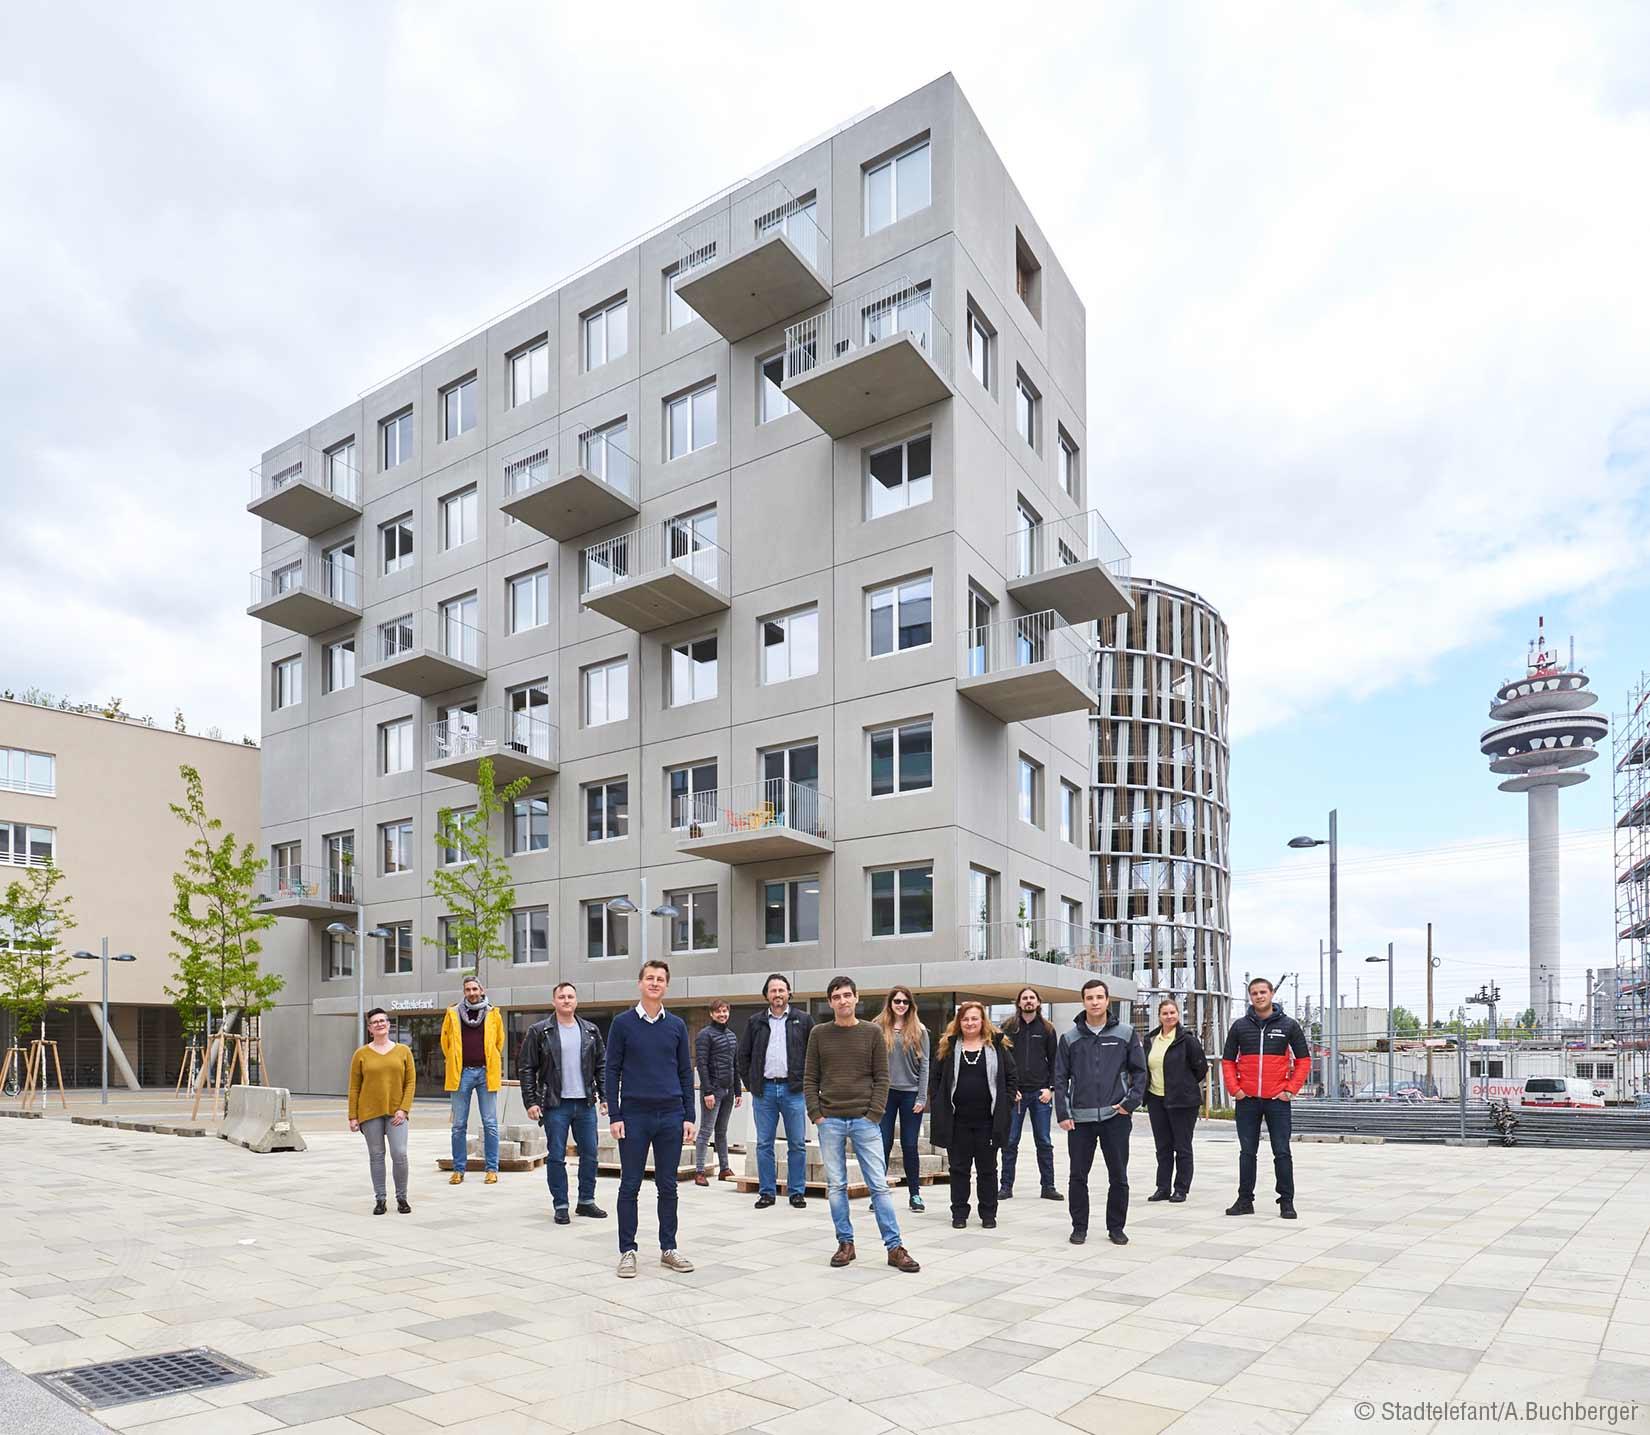 19-01-07-neues-buero-stadtelefant-bloch-bauer-promenade-hoyer-brandschutz-wien